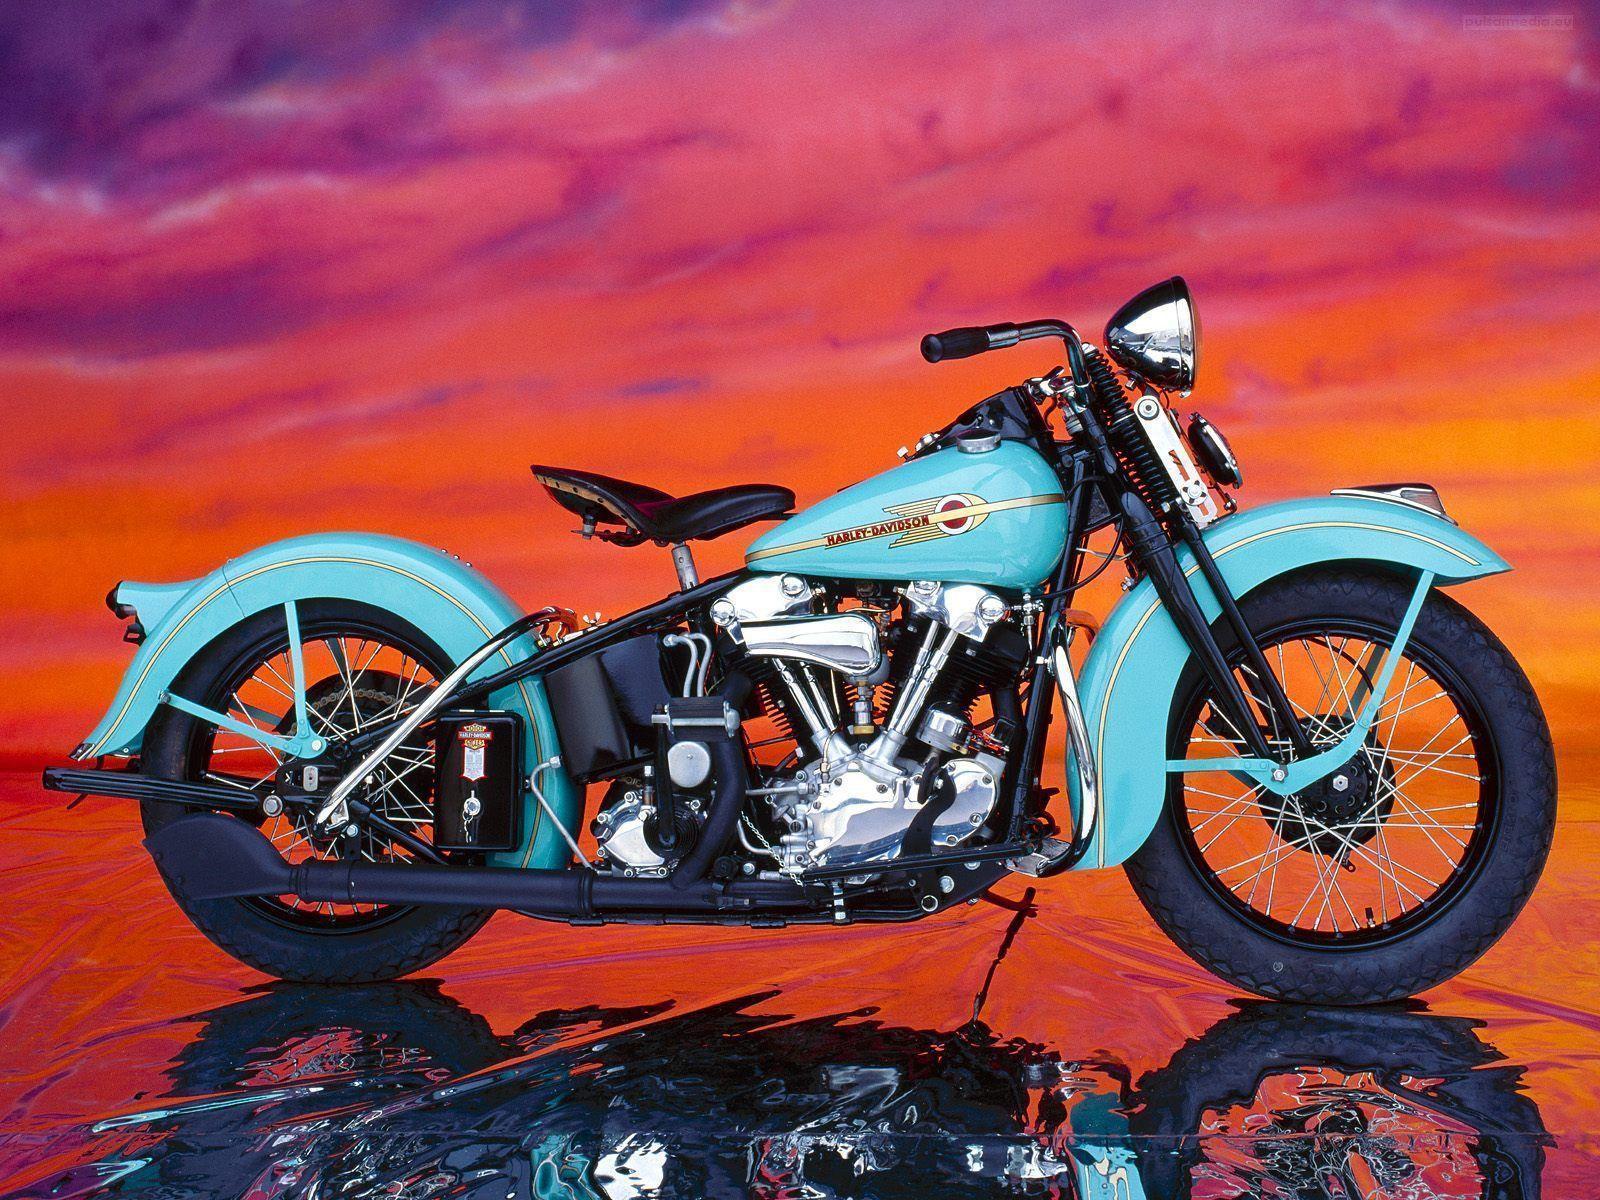 Harley Davidson Wallpaper Border